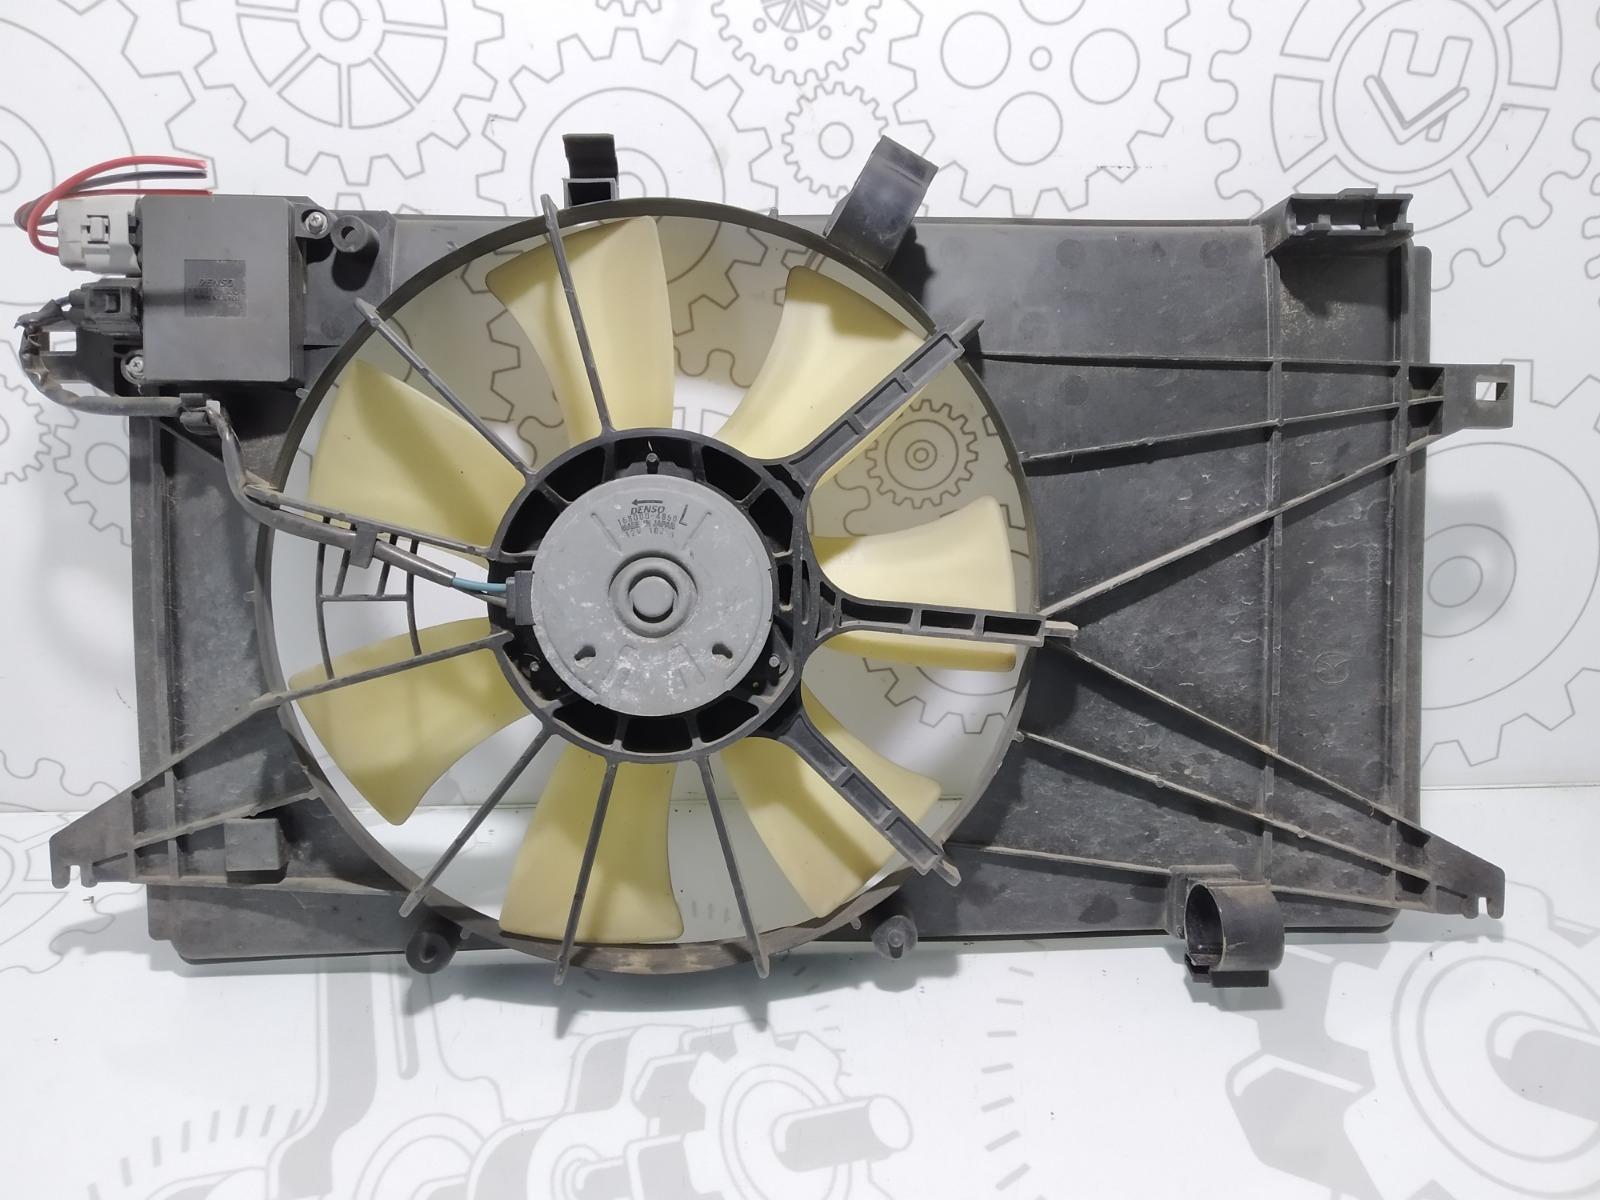 Вентилятор радиатора Mazda 5 2.0 TD 2008 (б/у)